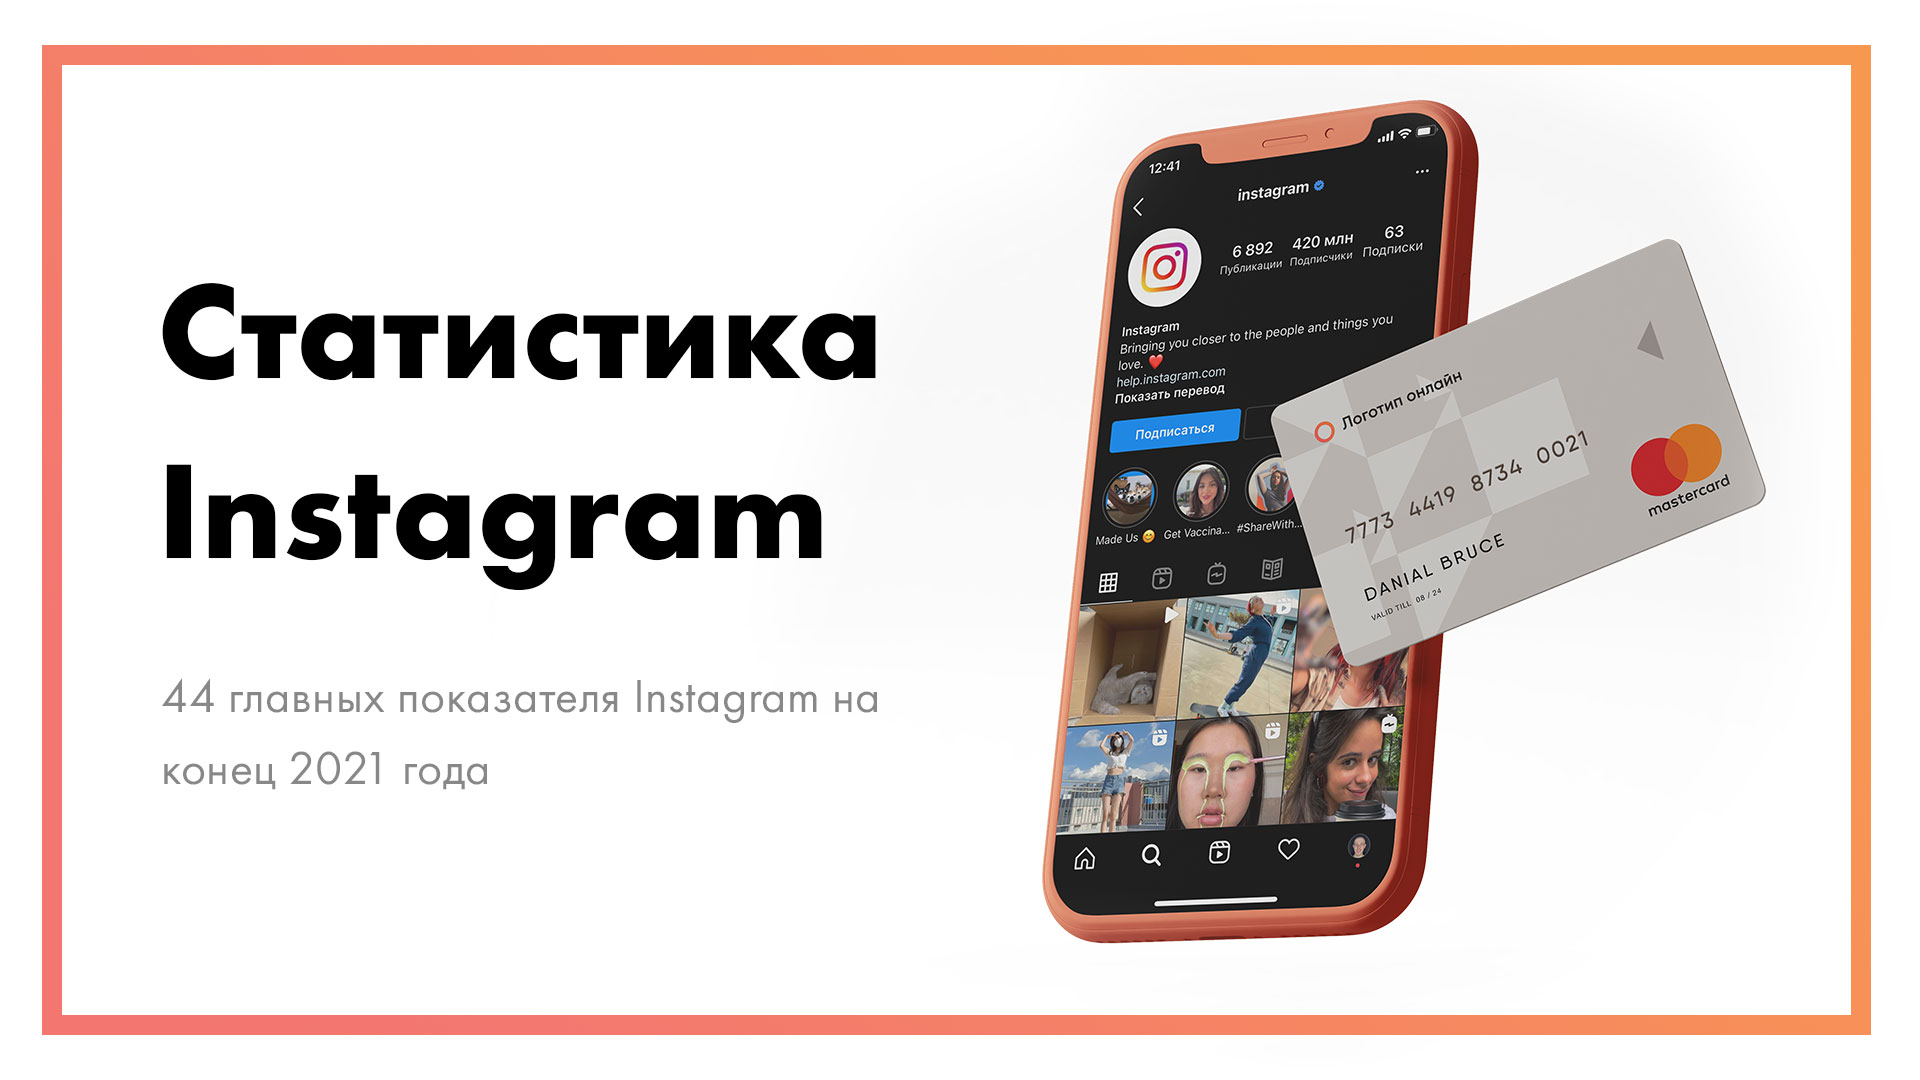 Статистика-Instagram---44-показателя-[конец-2021-года].jpg